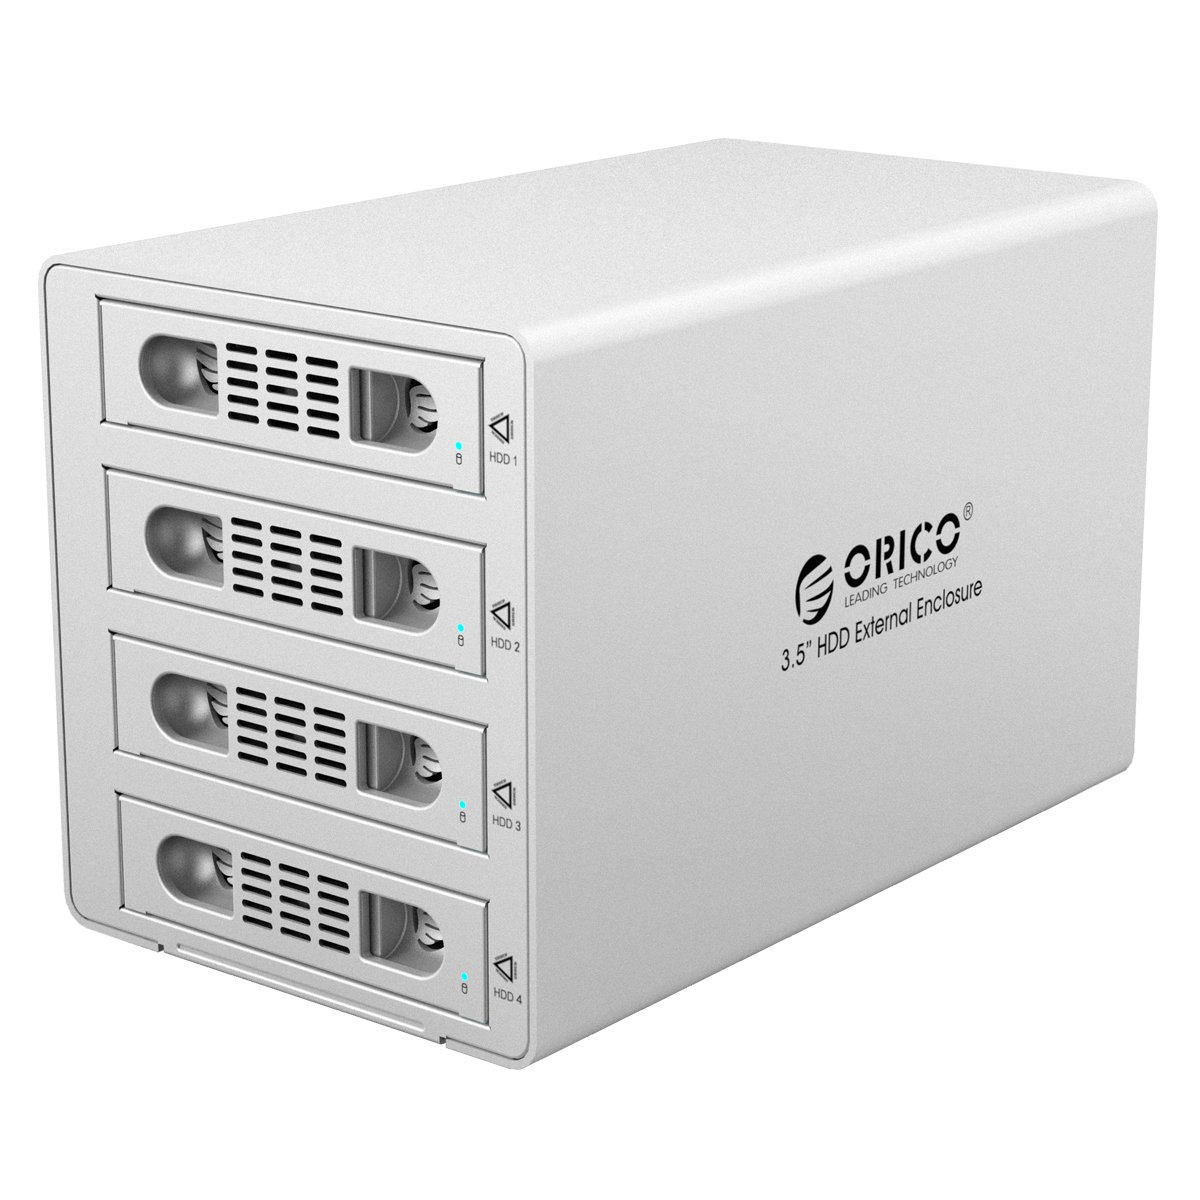 ORICO Aluminum 4 Bay 3.5 inch Hard Disk Drive Case HDD RAID Enclosure ,USB 3.0 & eSATA Support UASP and SATA III 6.0Gbps Speed (3549RUS3)